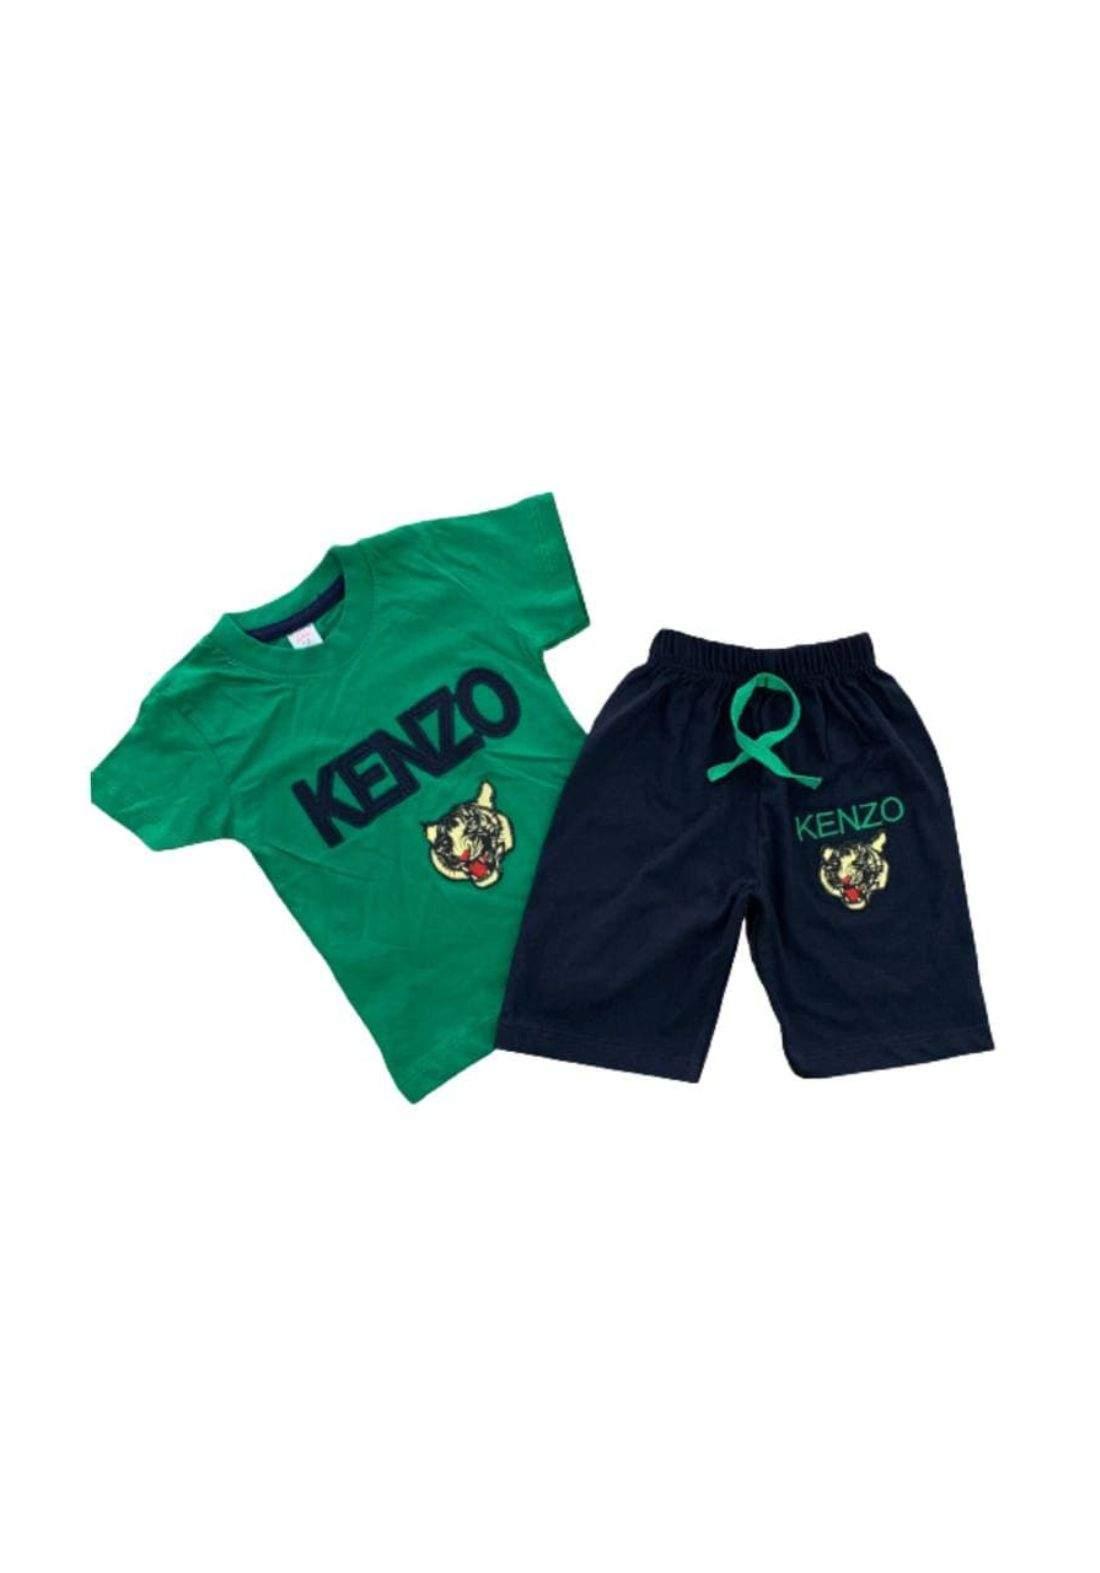 tracksuit for boys green  (t-shirt+short) ( تراكسوت ولادي  اخضر  (شورت و تيشيرت